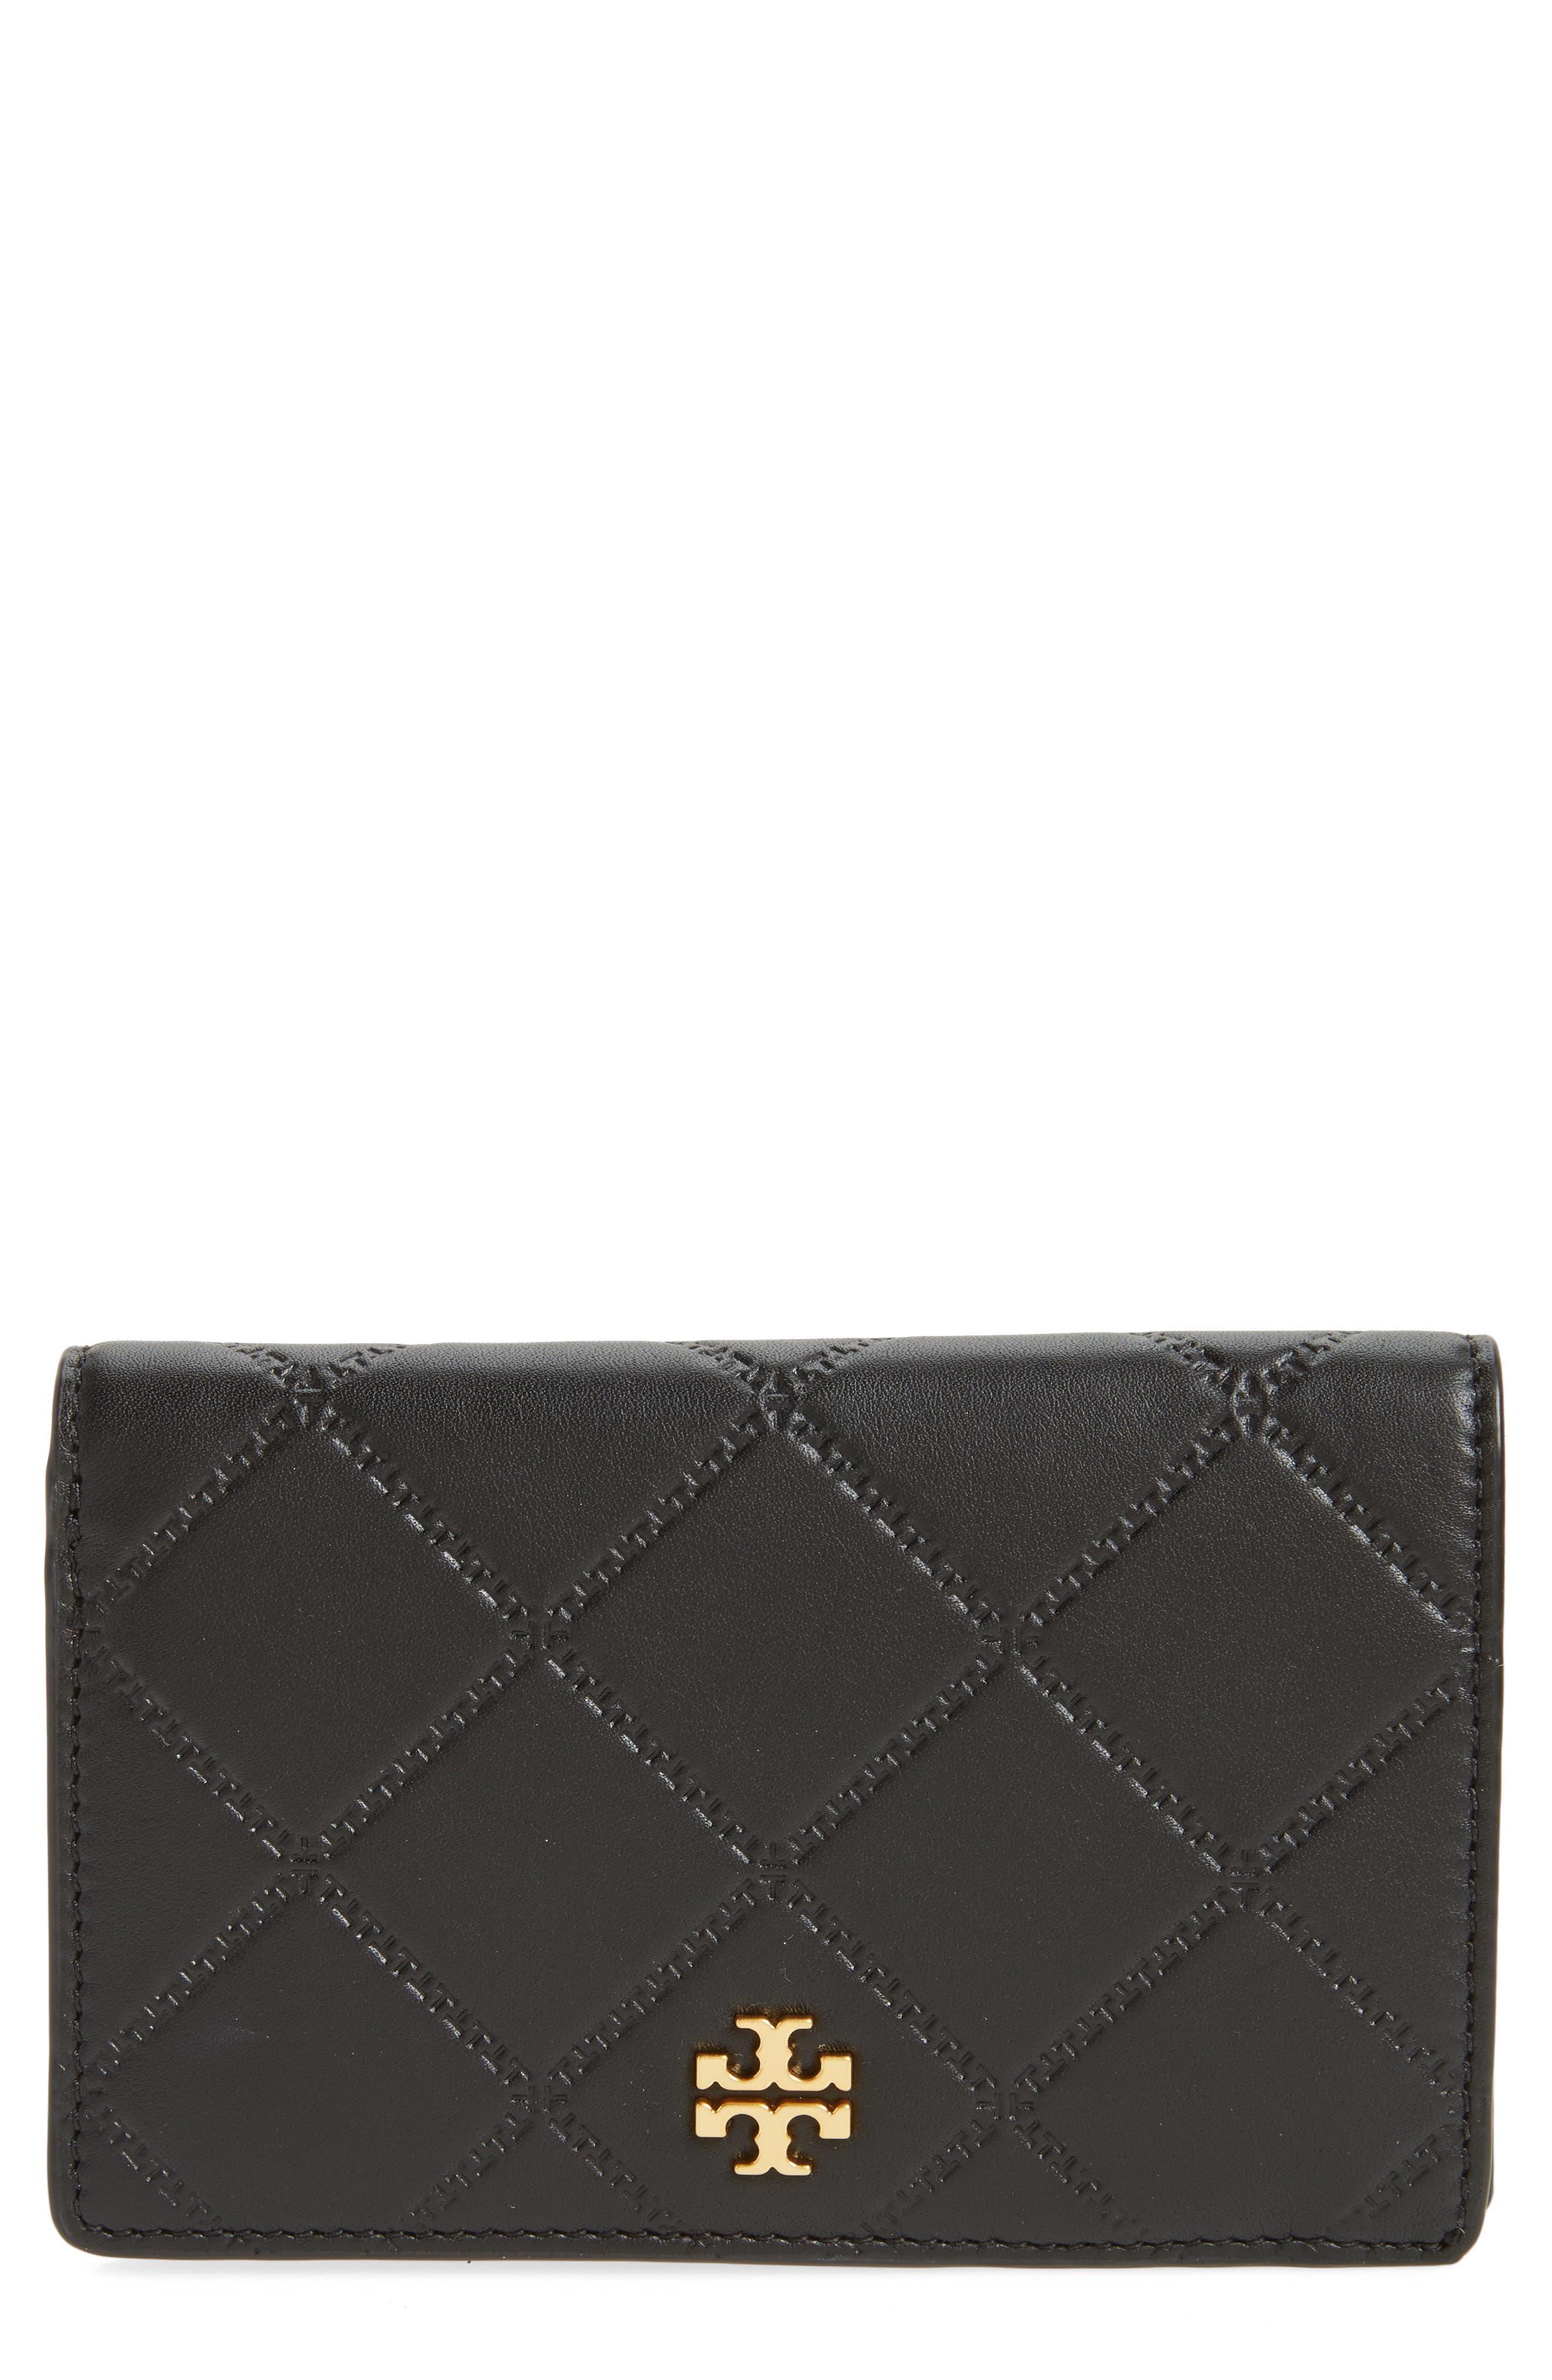 Medium Georgia Slim Leather Wallet, Main, color, 001